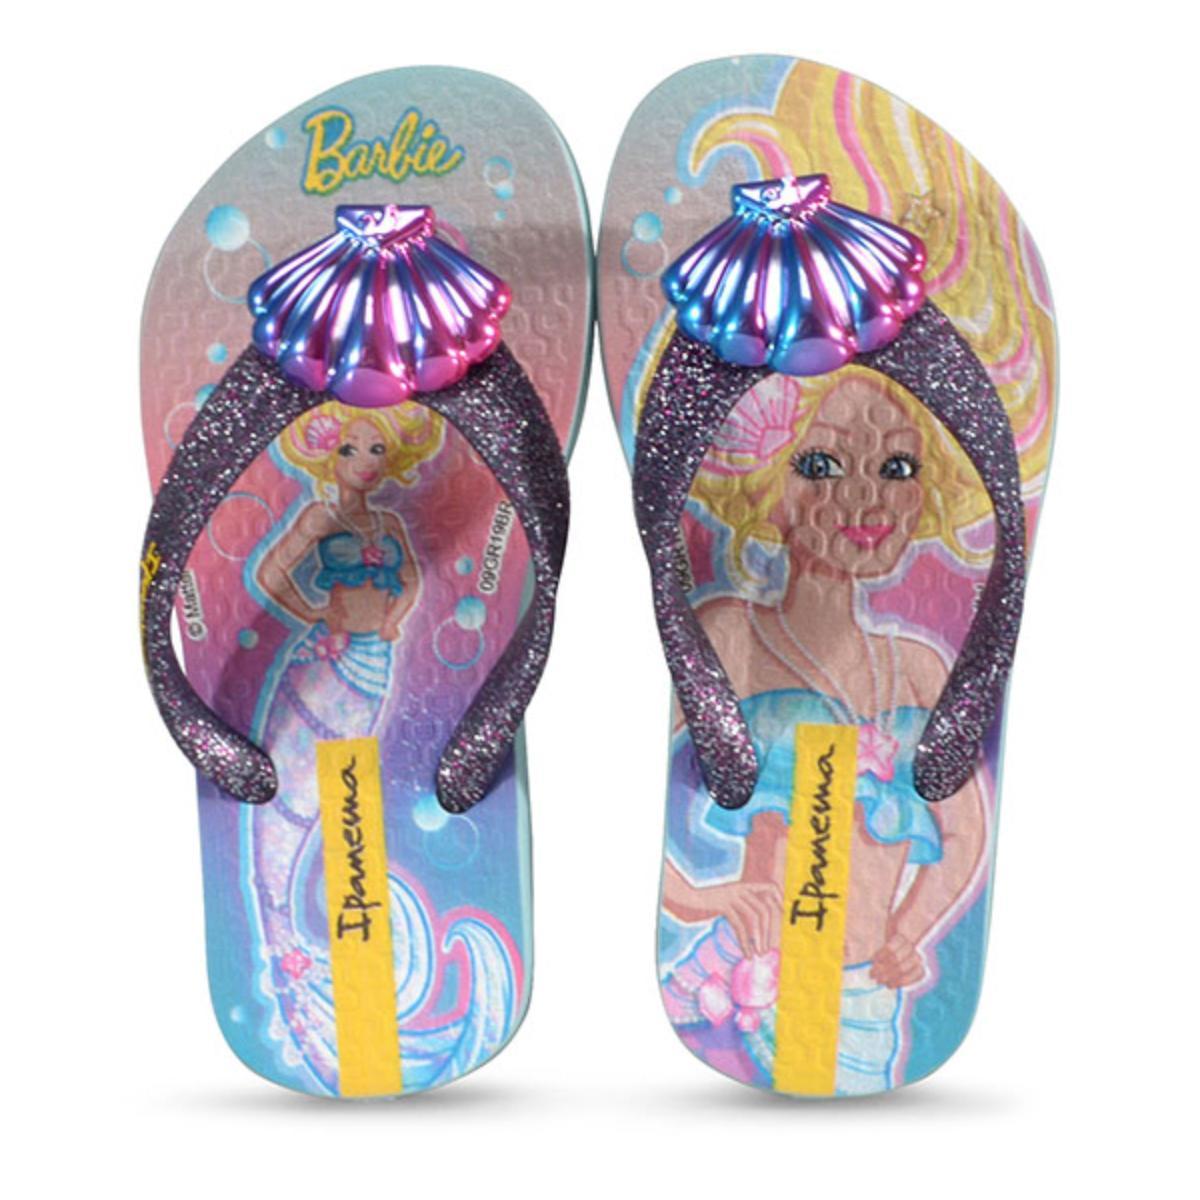 Chinelo Fem Infantil Grendene 26380 25163 Ipanema Barbie Sereia Azul Gliter Misto